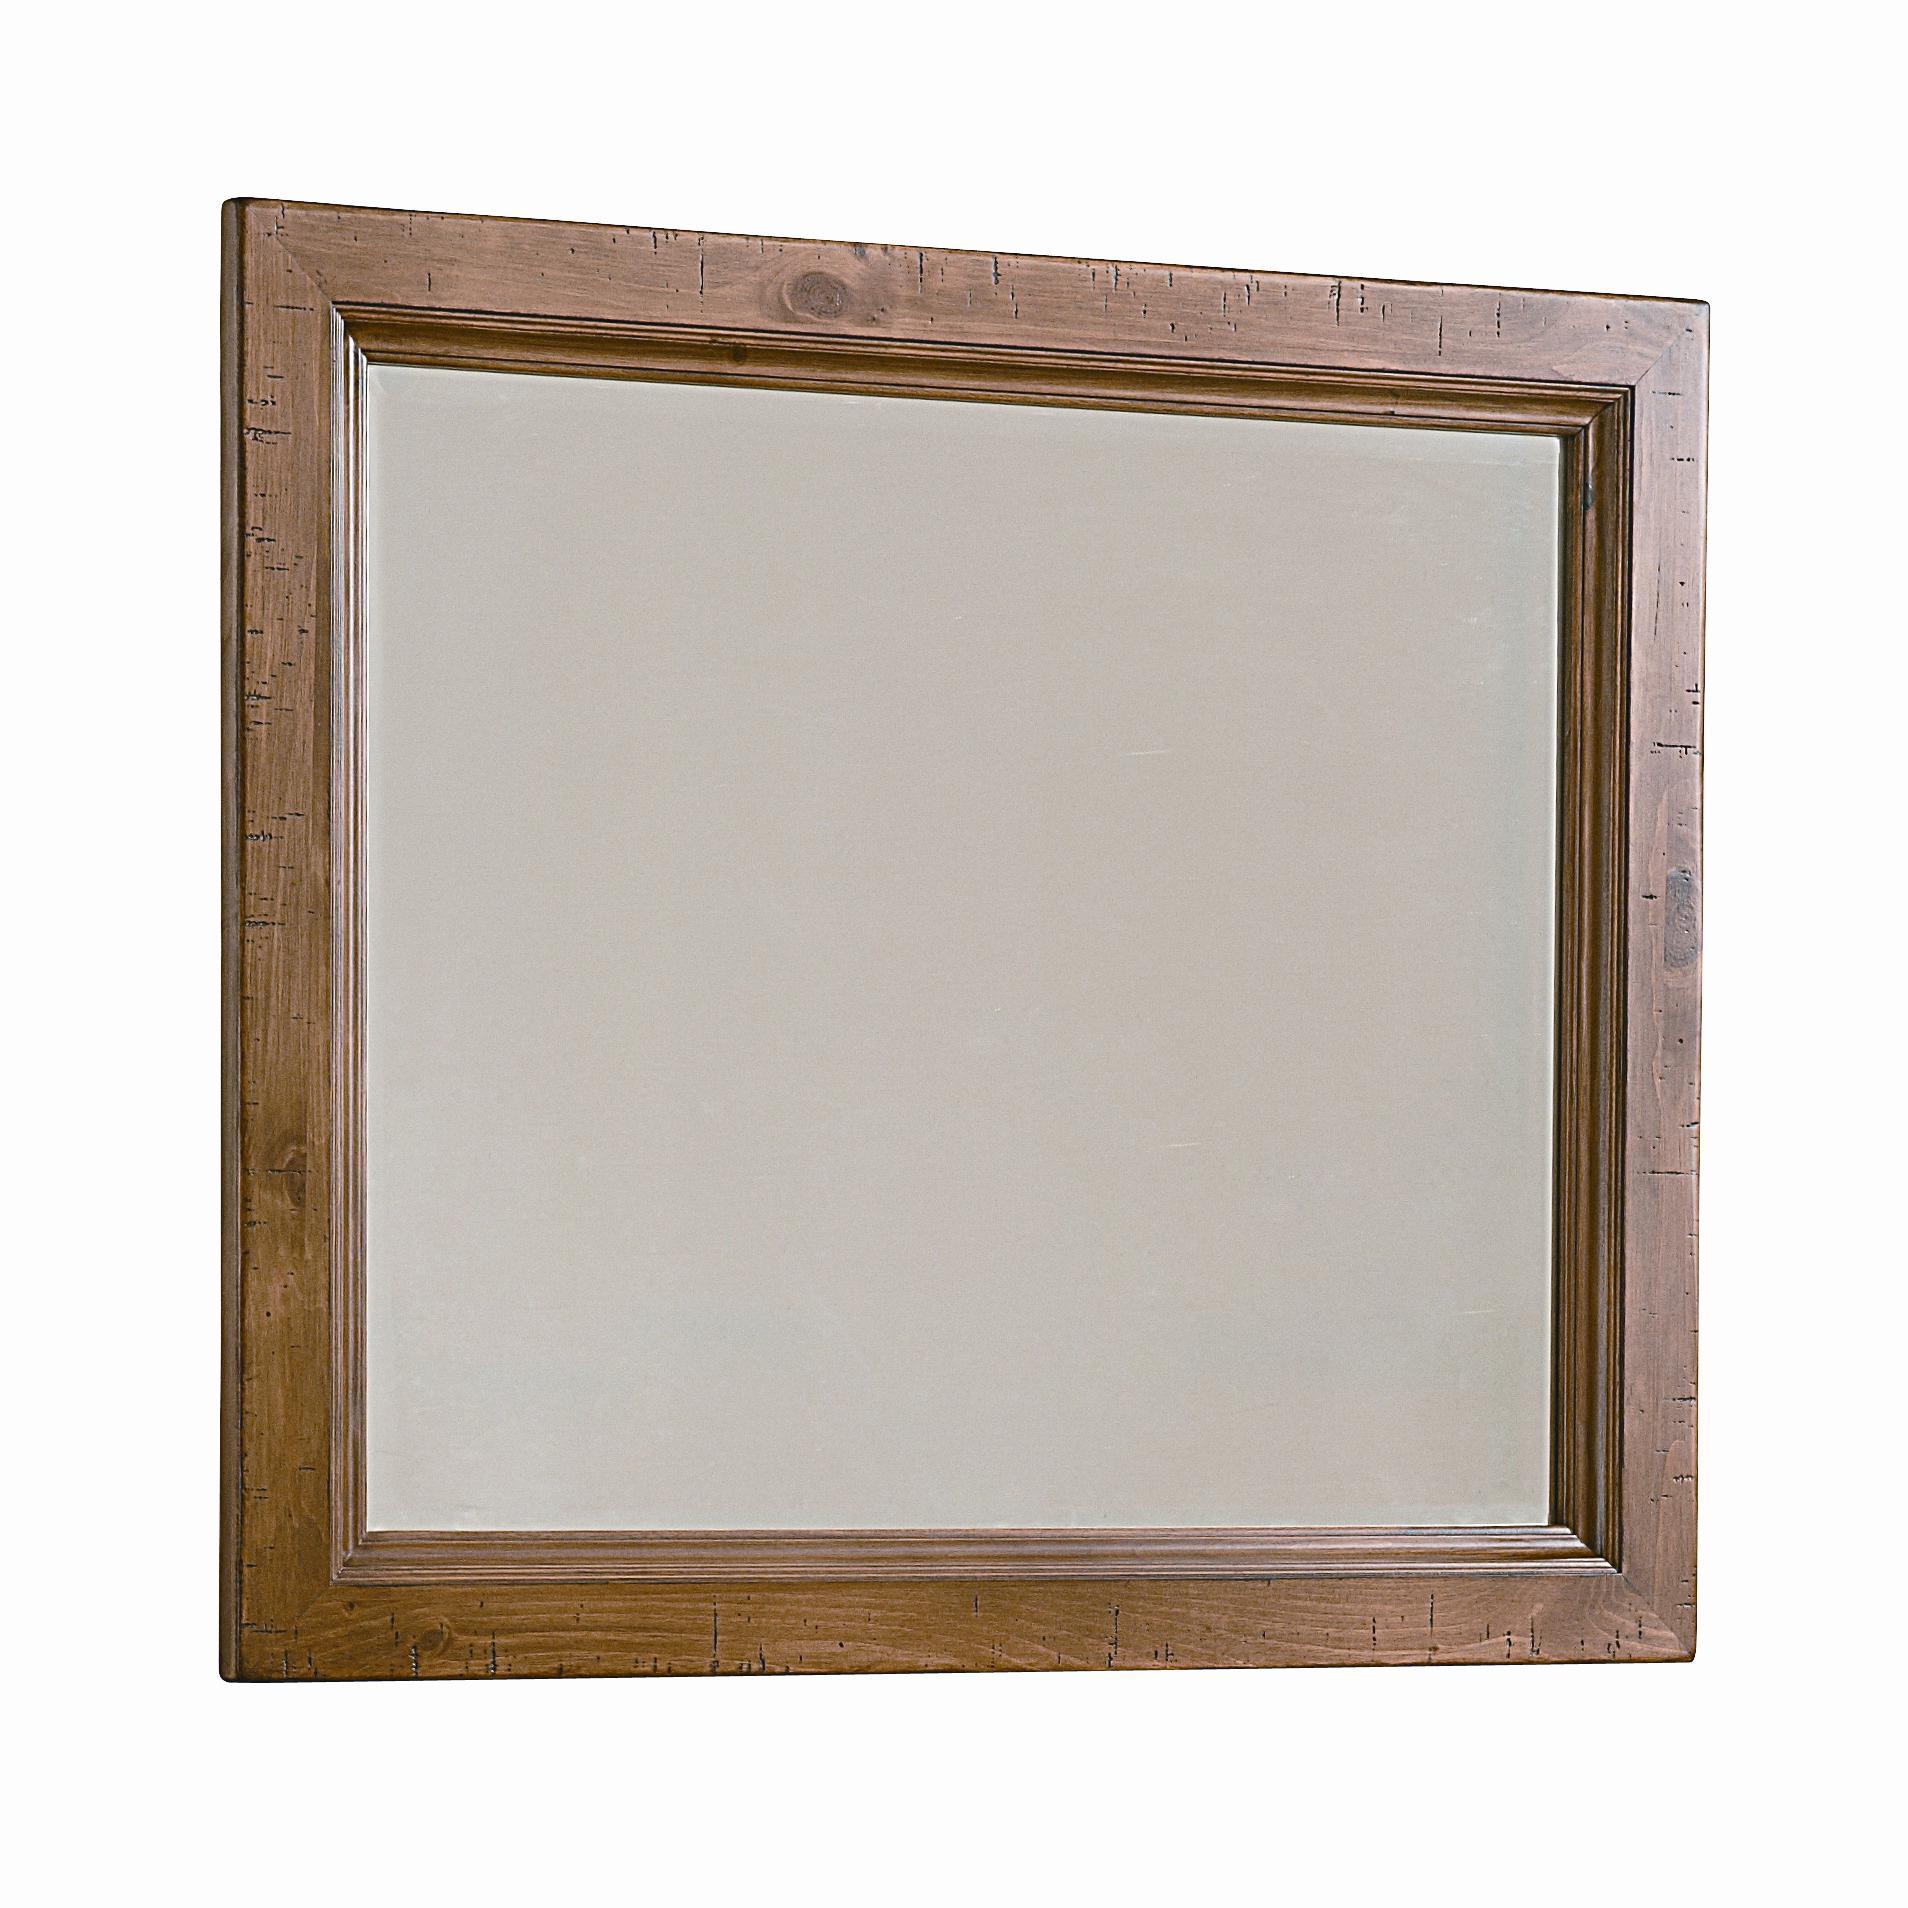 Vaughan Bassett Timber Mill Chesser Mirror - bevel glass - Item Number: BB54-446